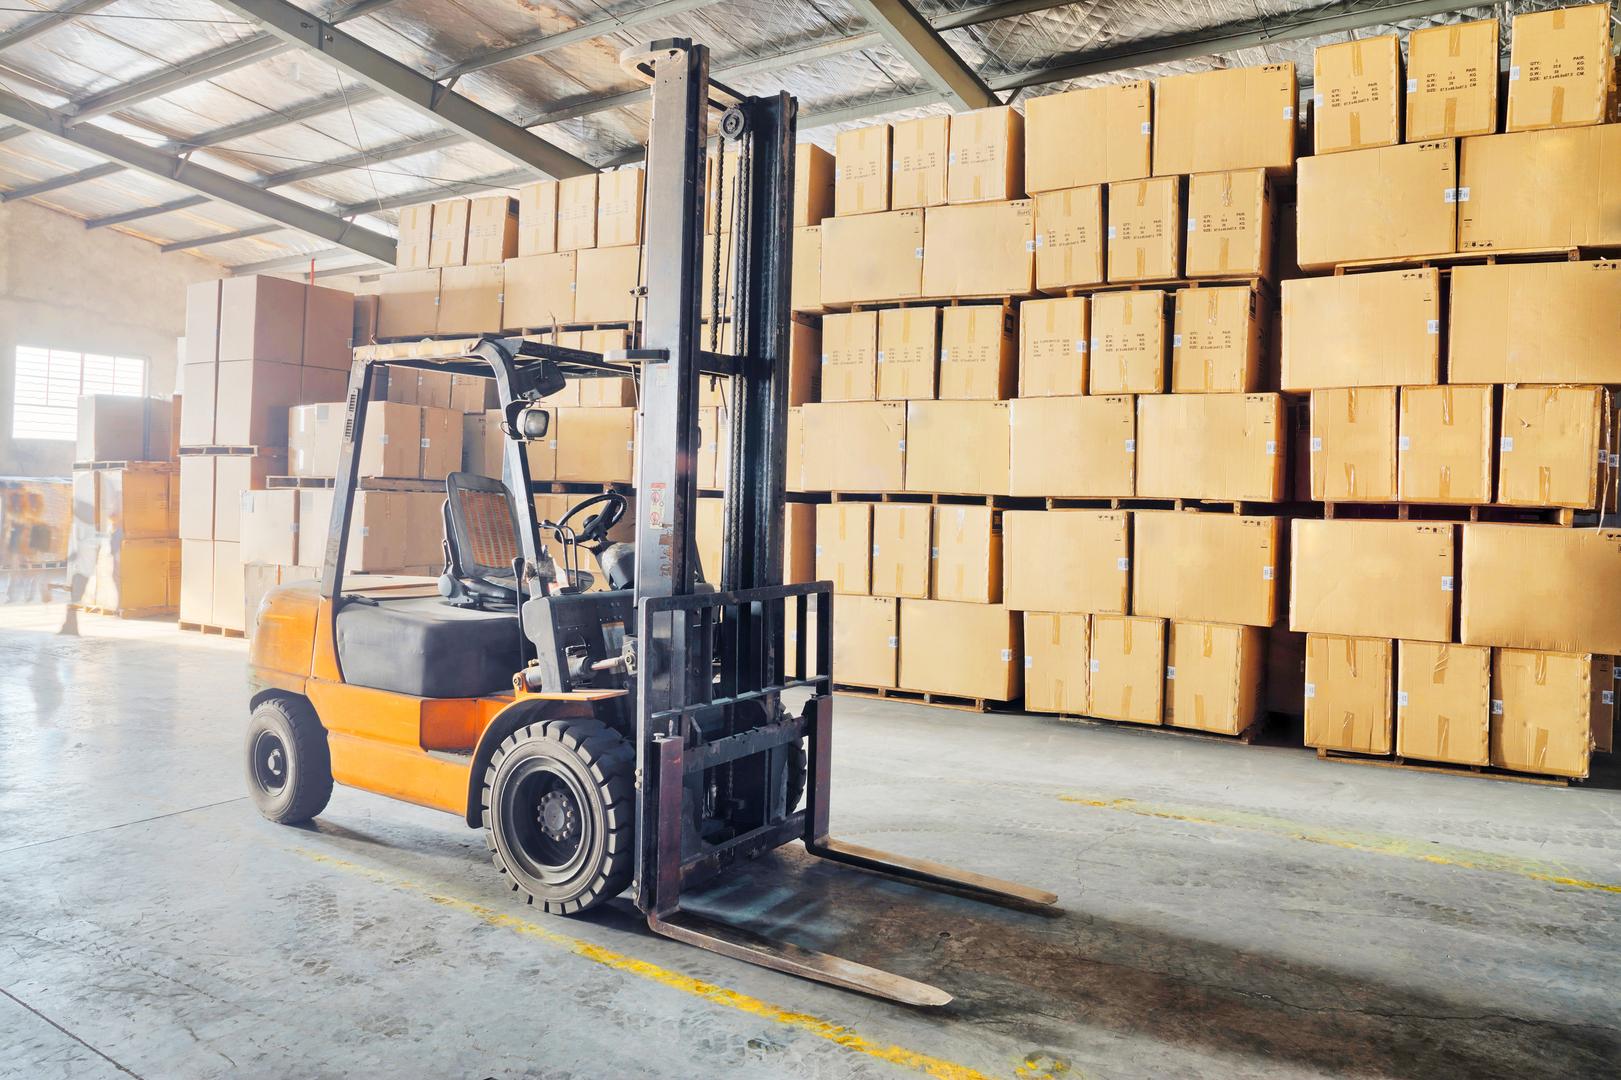 Spice Storage and Distribution - B&B Warehousing